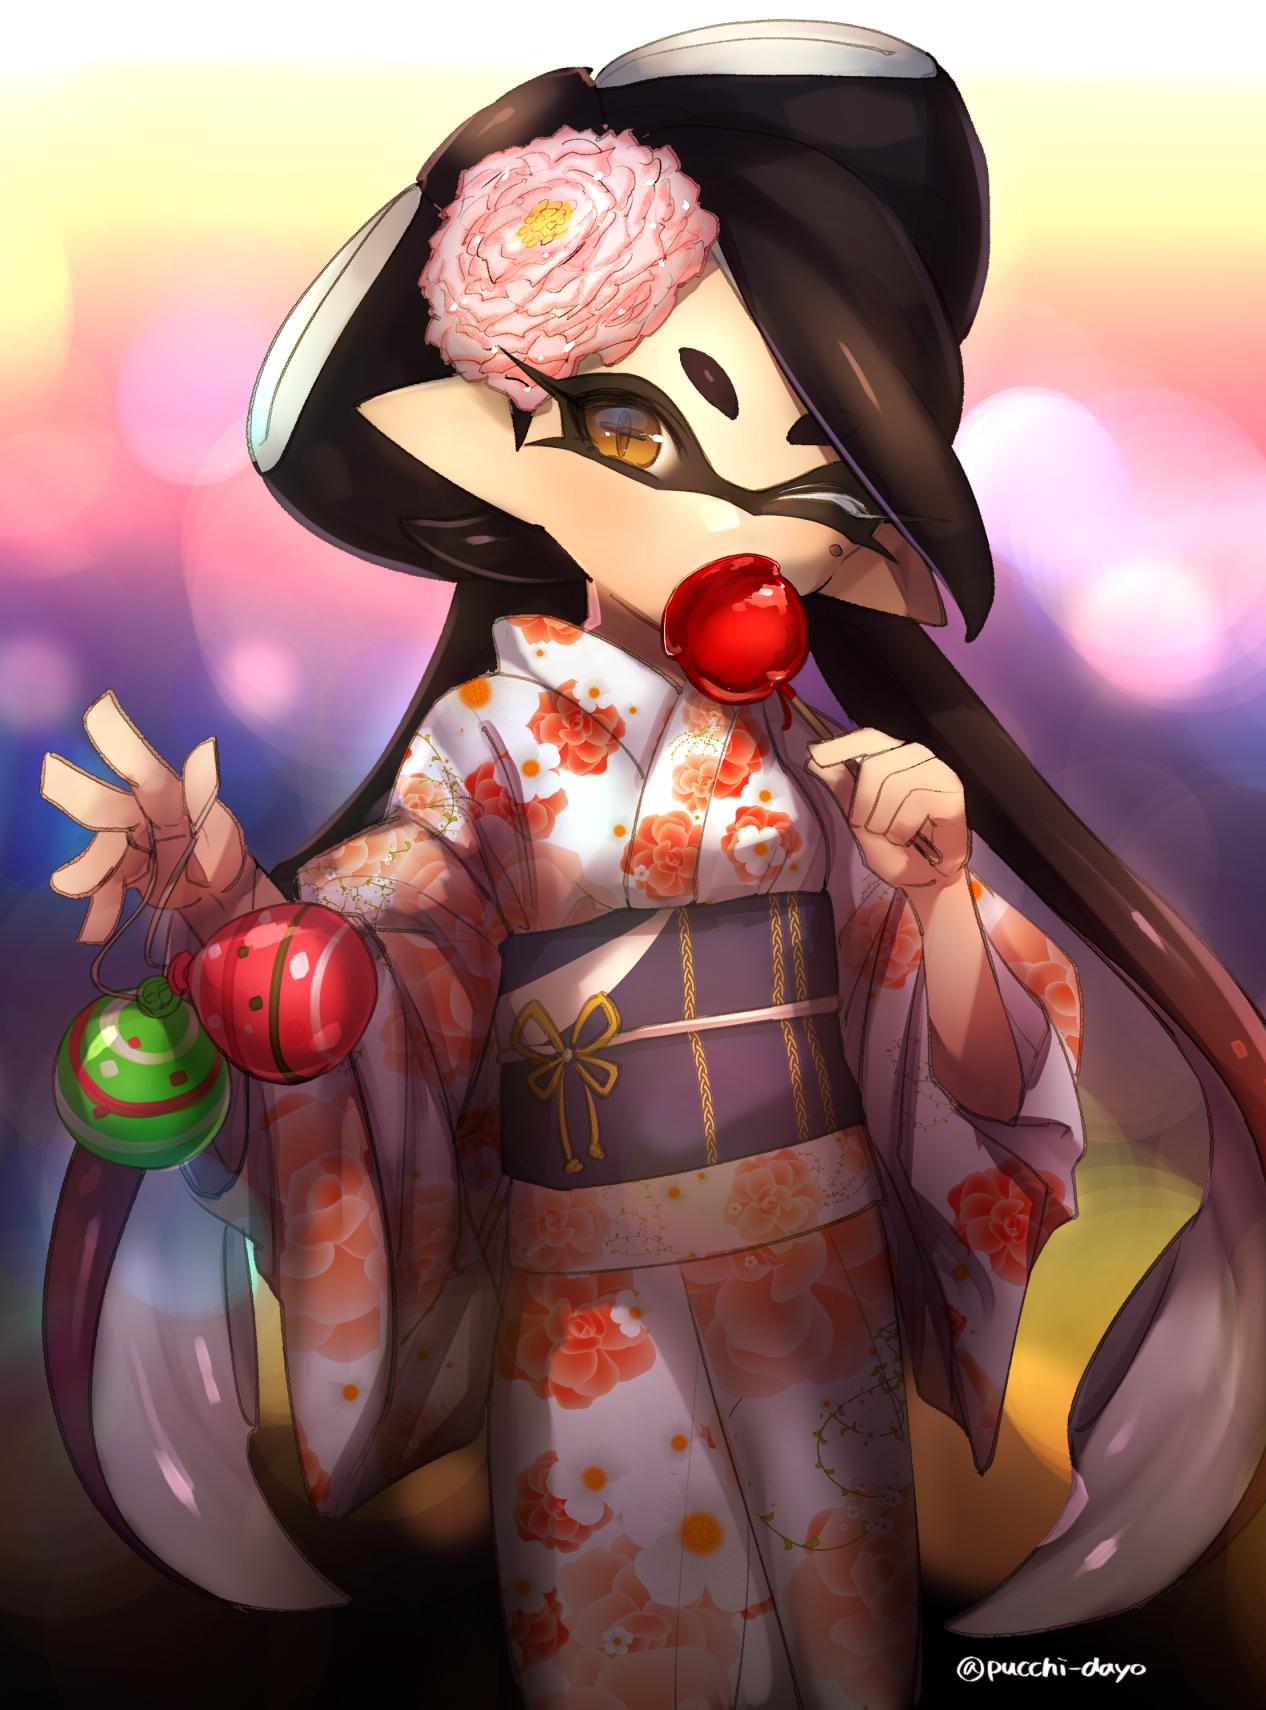 Aioli Splatoon aori (splatoon) (callie (splatoon)) - zerochan anime image board